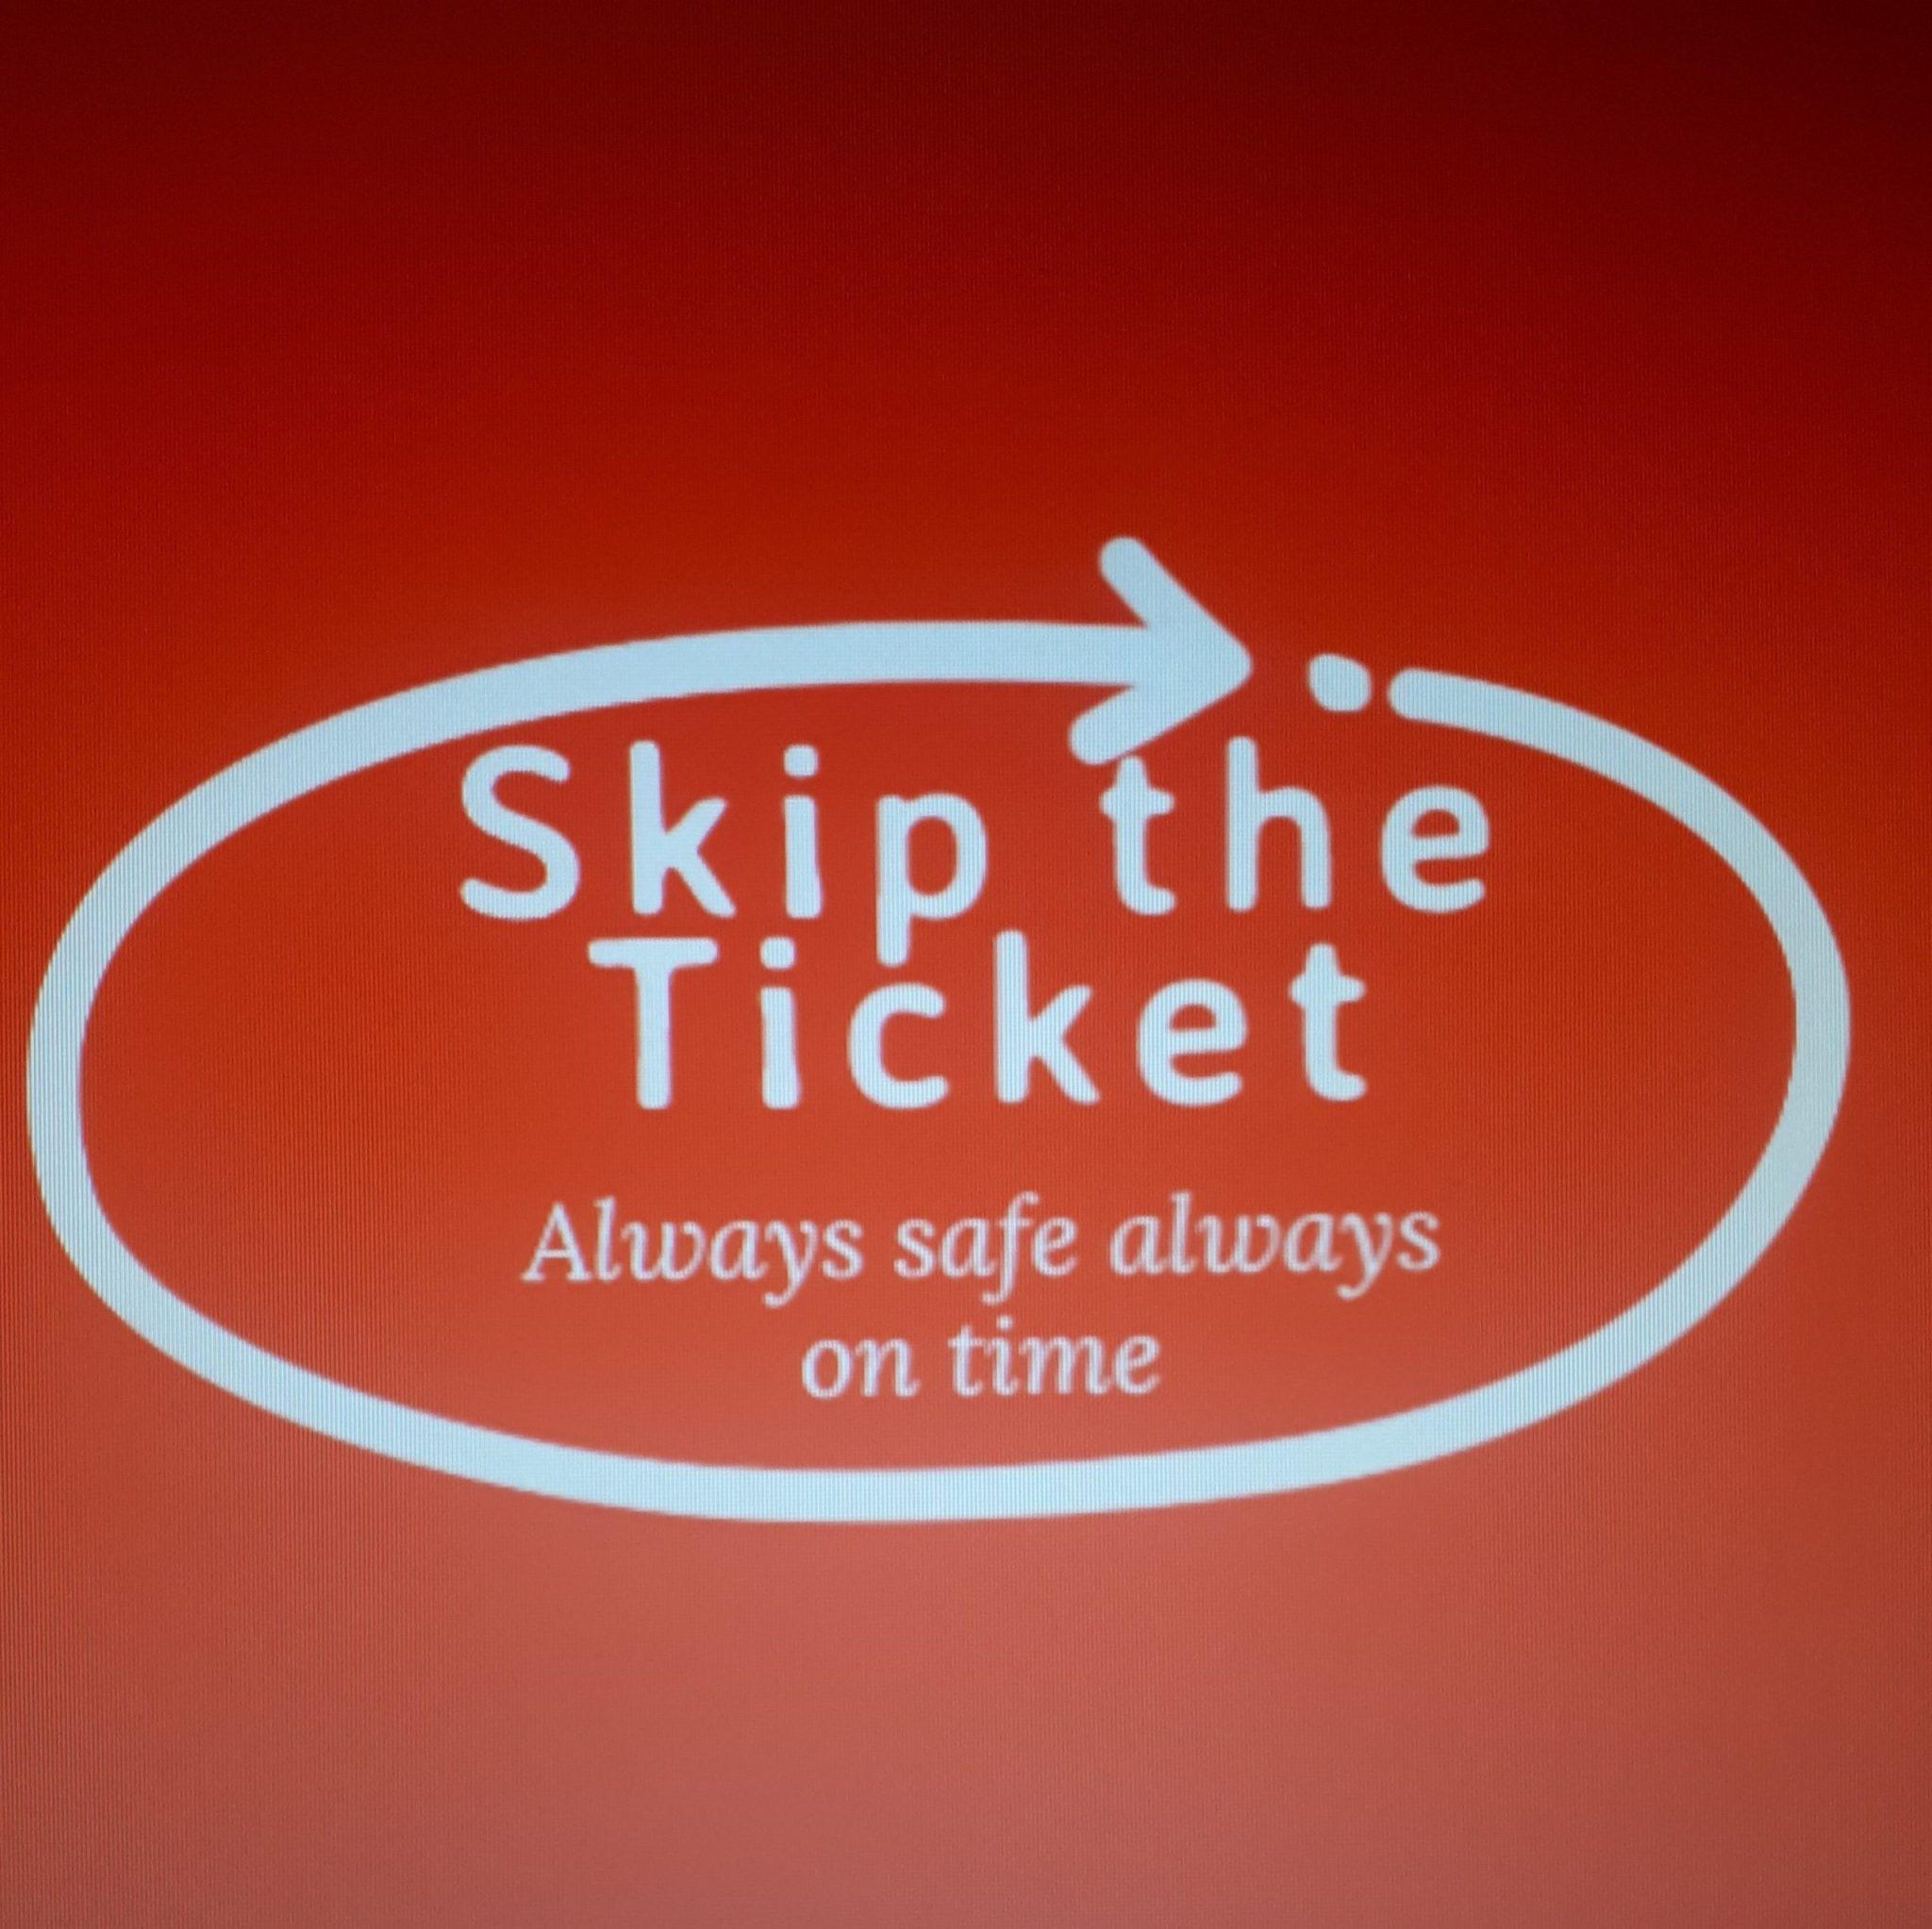 skip the ticket logo